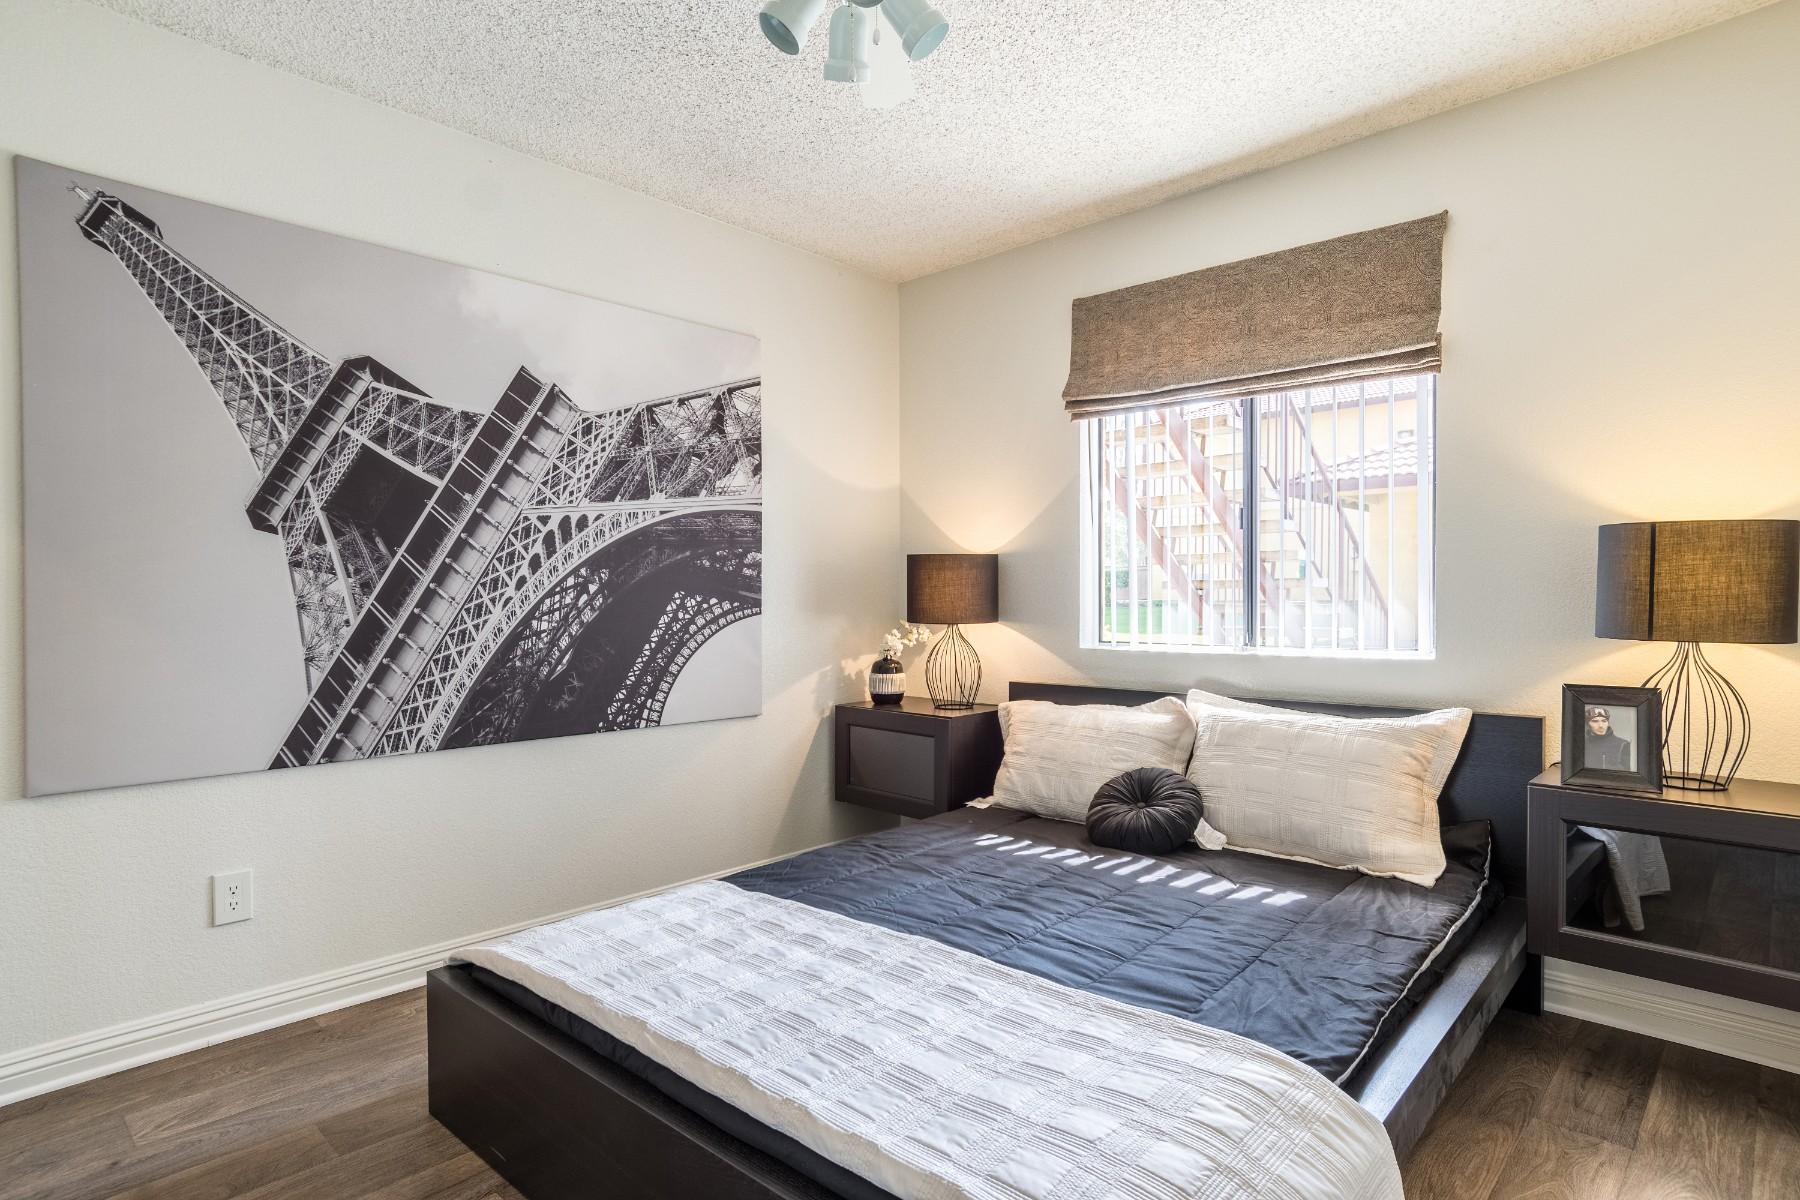 Copper Canyon Apartments 1234 W Blaine St, Riverside, CA 92507 - YP.com